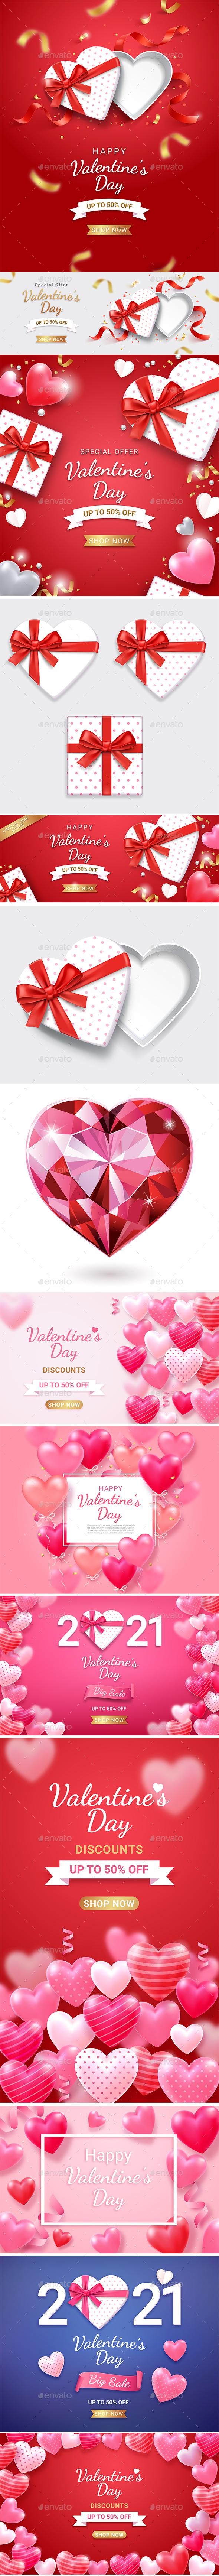 Set of Valentine Day Background